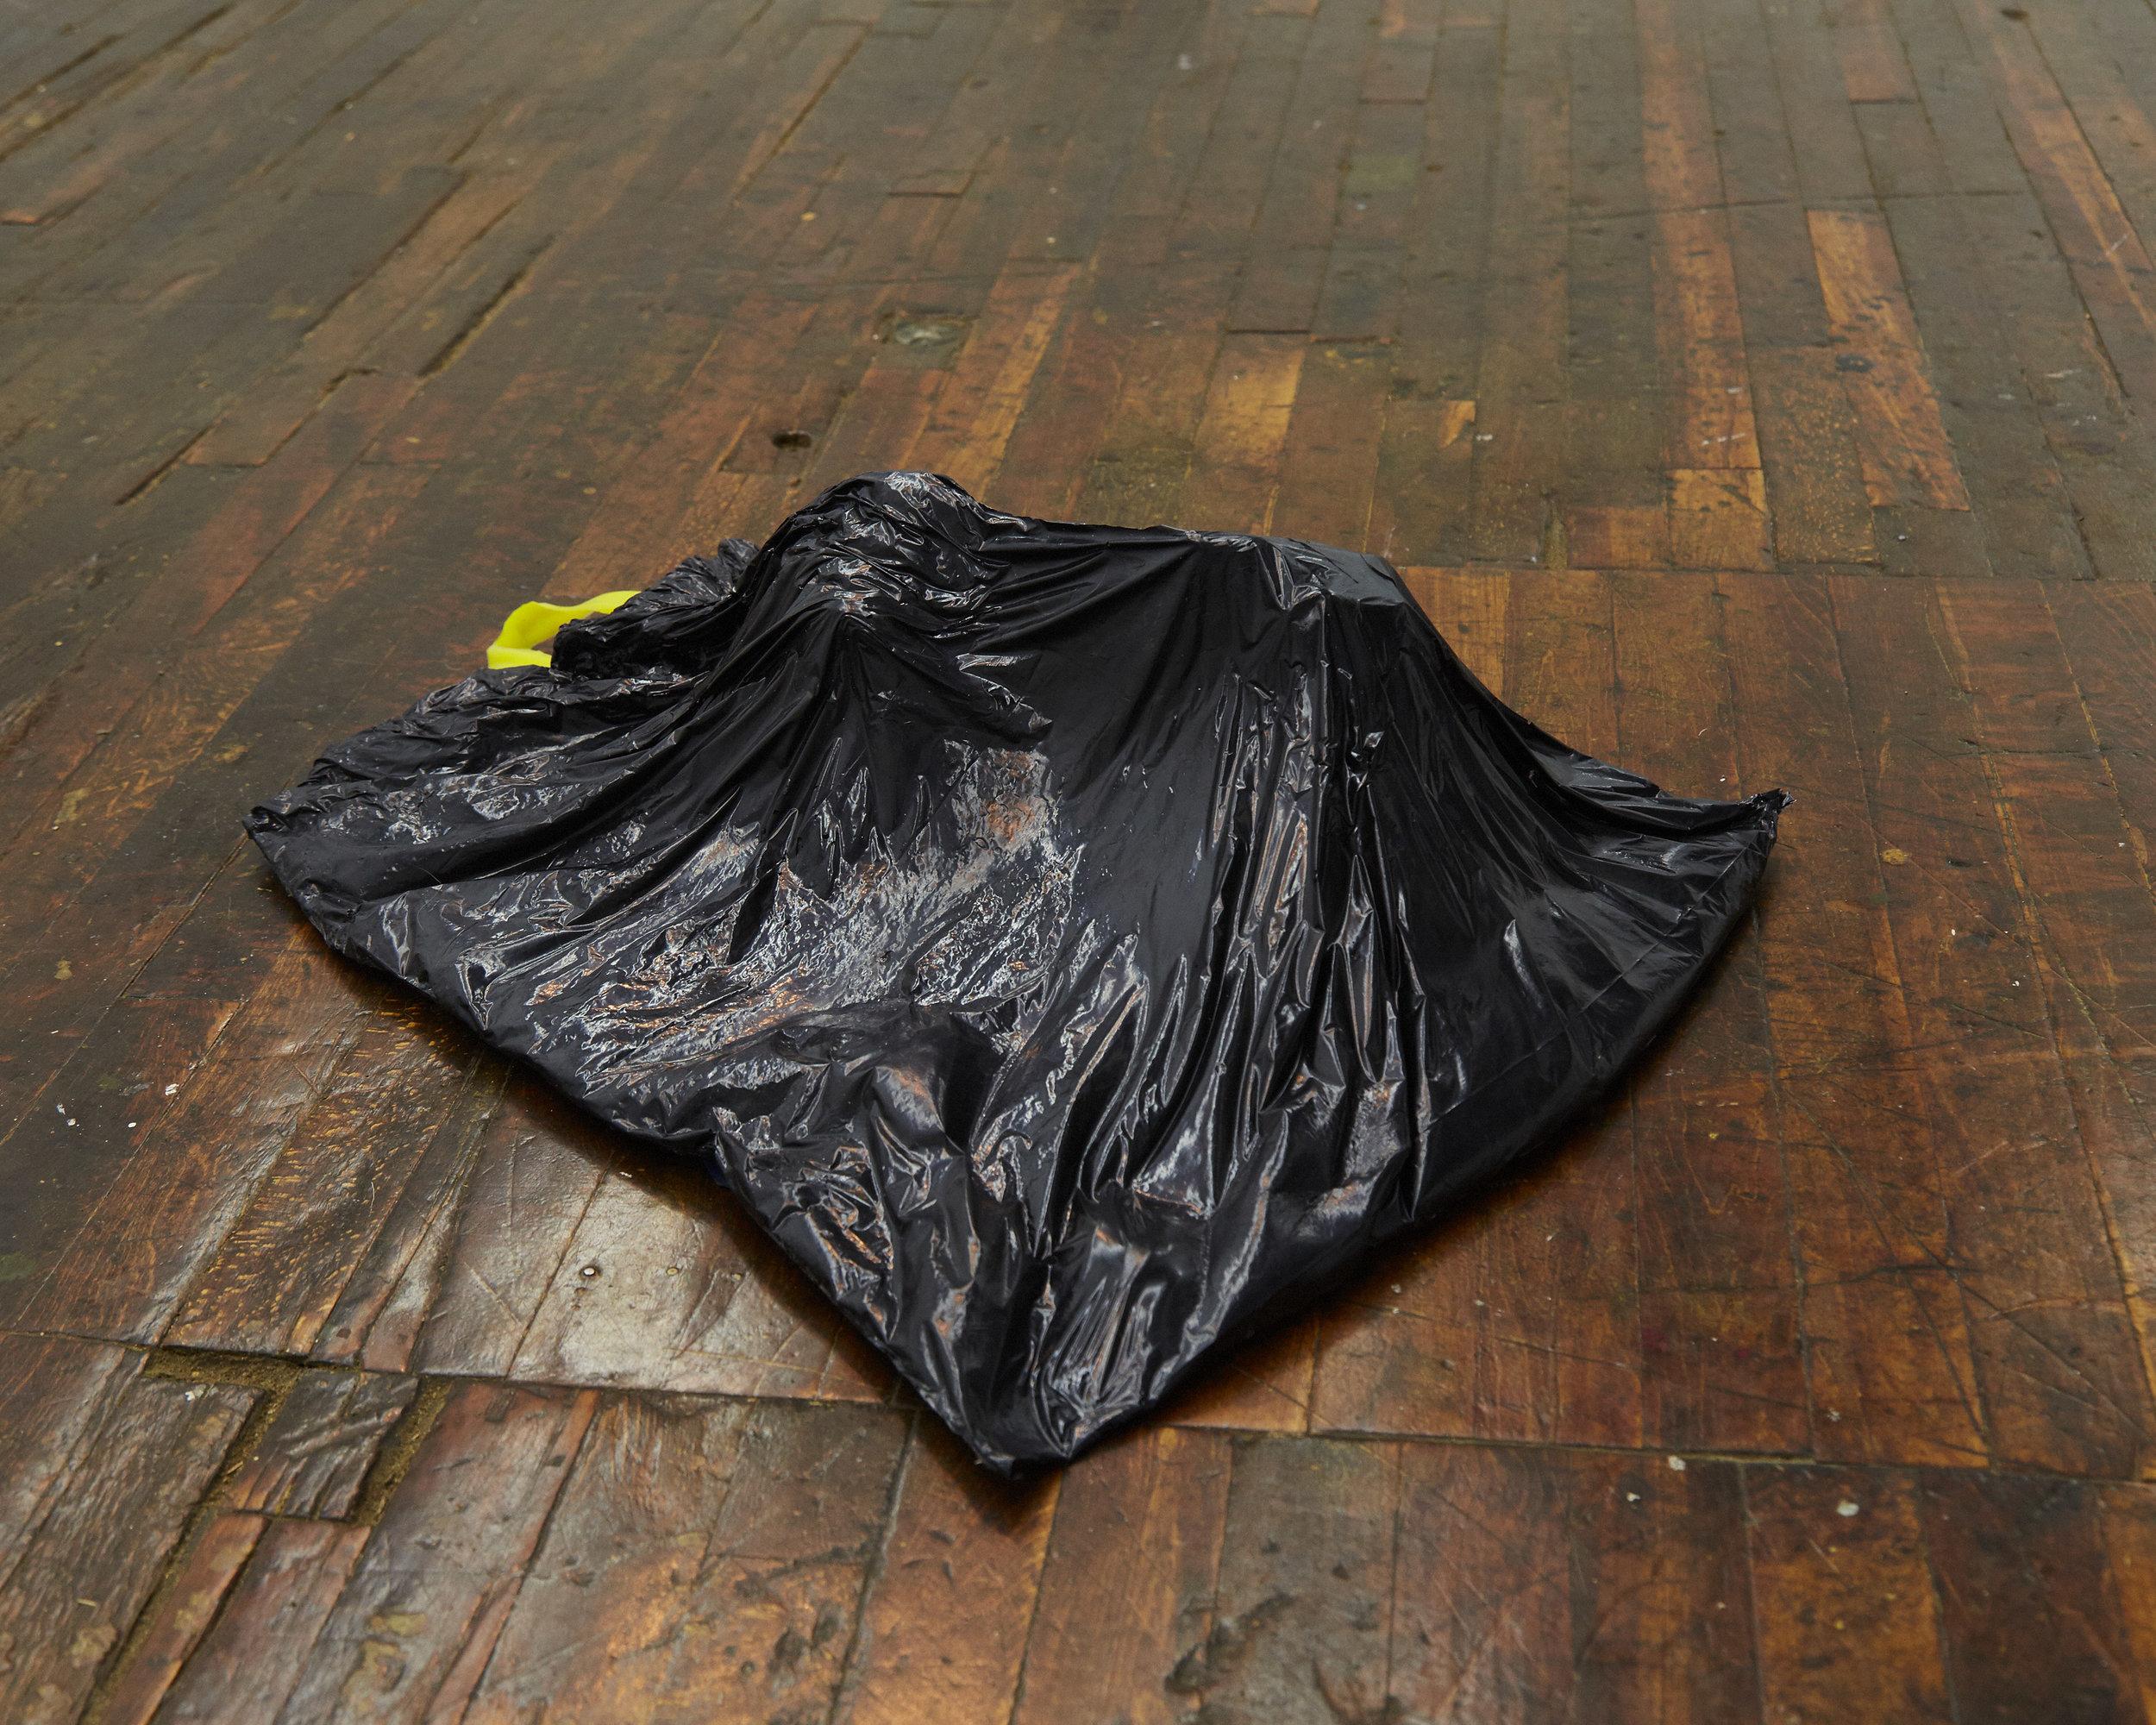 Jonathan Santoro,  From Marrow Wonder , Cast urethane plastic, cast silicone rubber, wire, urethane foam, 2017